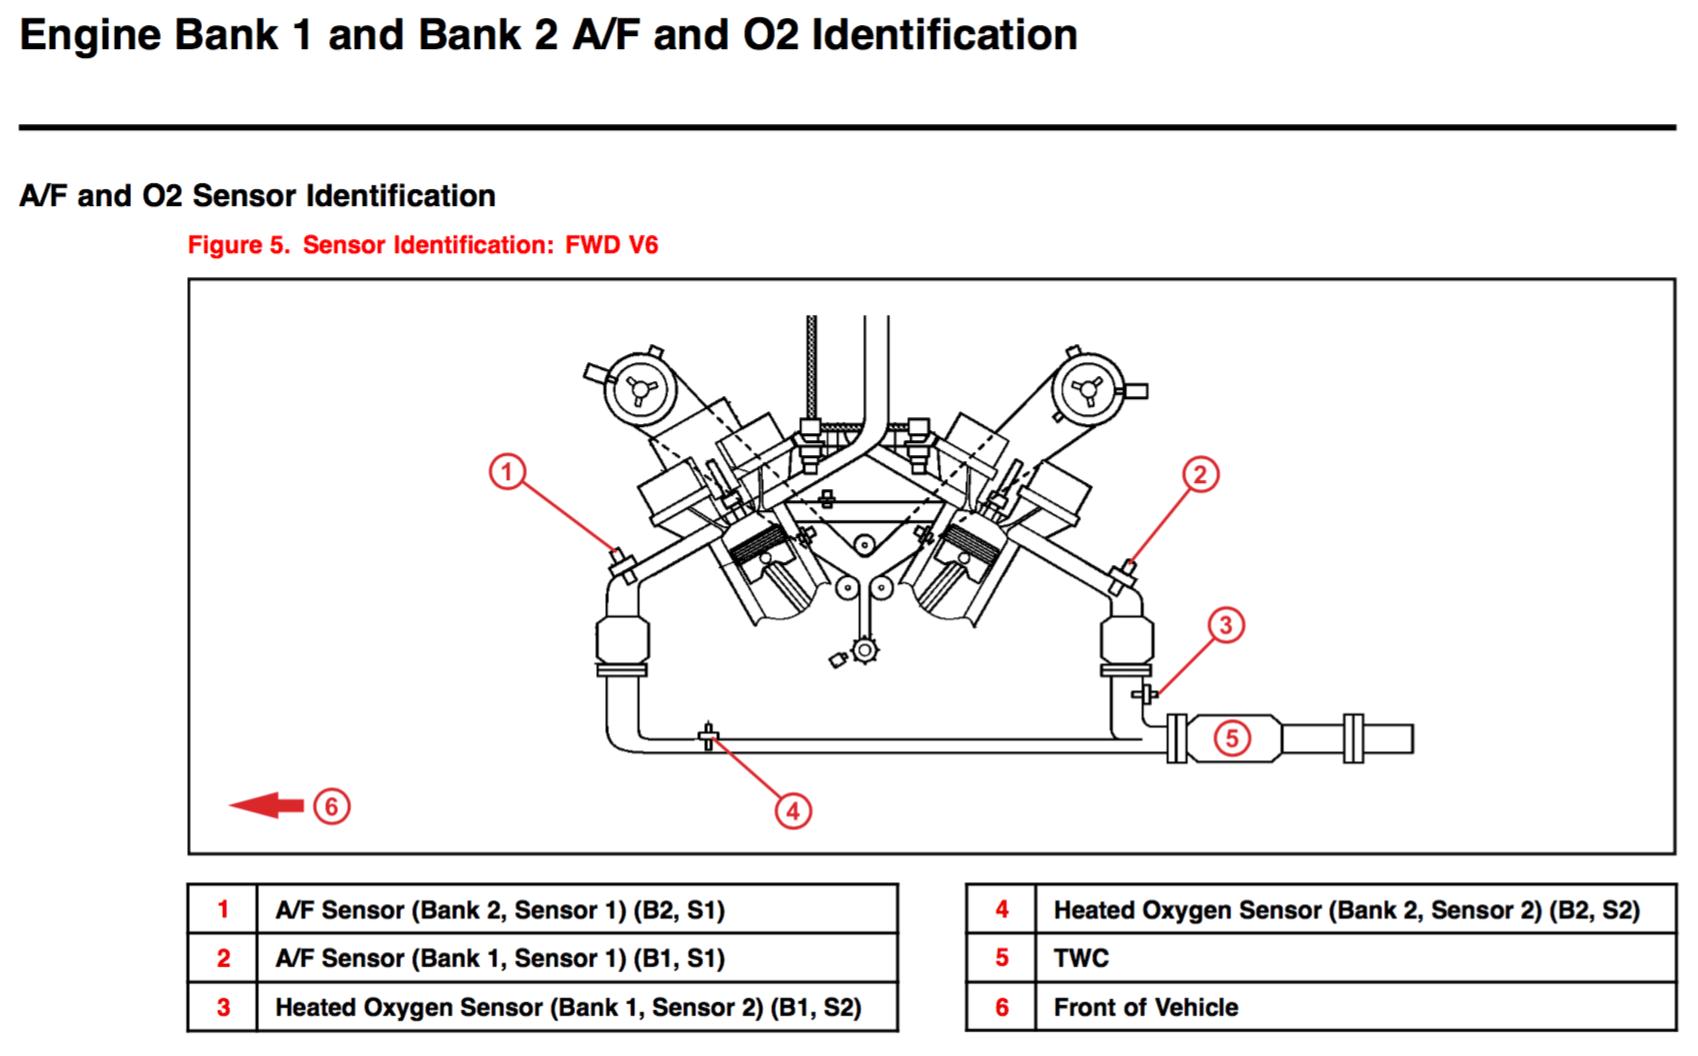 lexus 02 sensor location diagram high voltage circuit oxygen part numbering clublexus forum